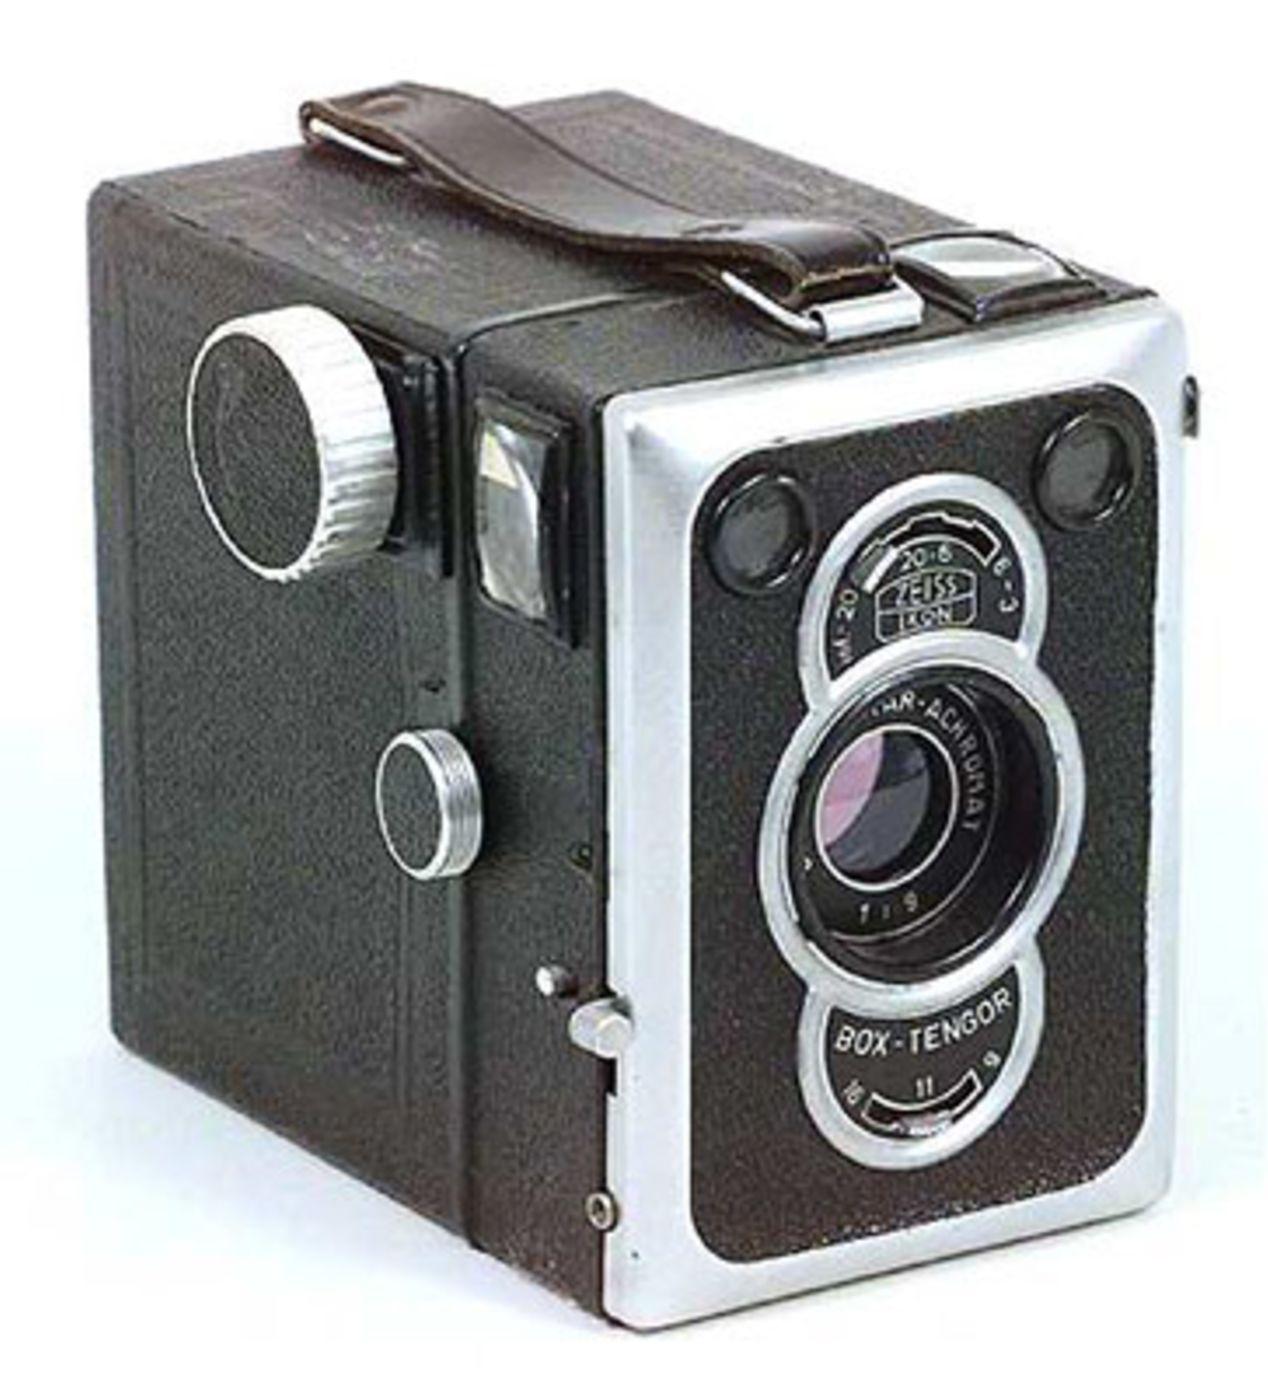 Box Tengor model 56/2